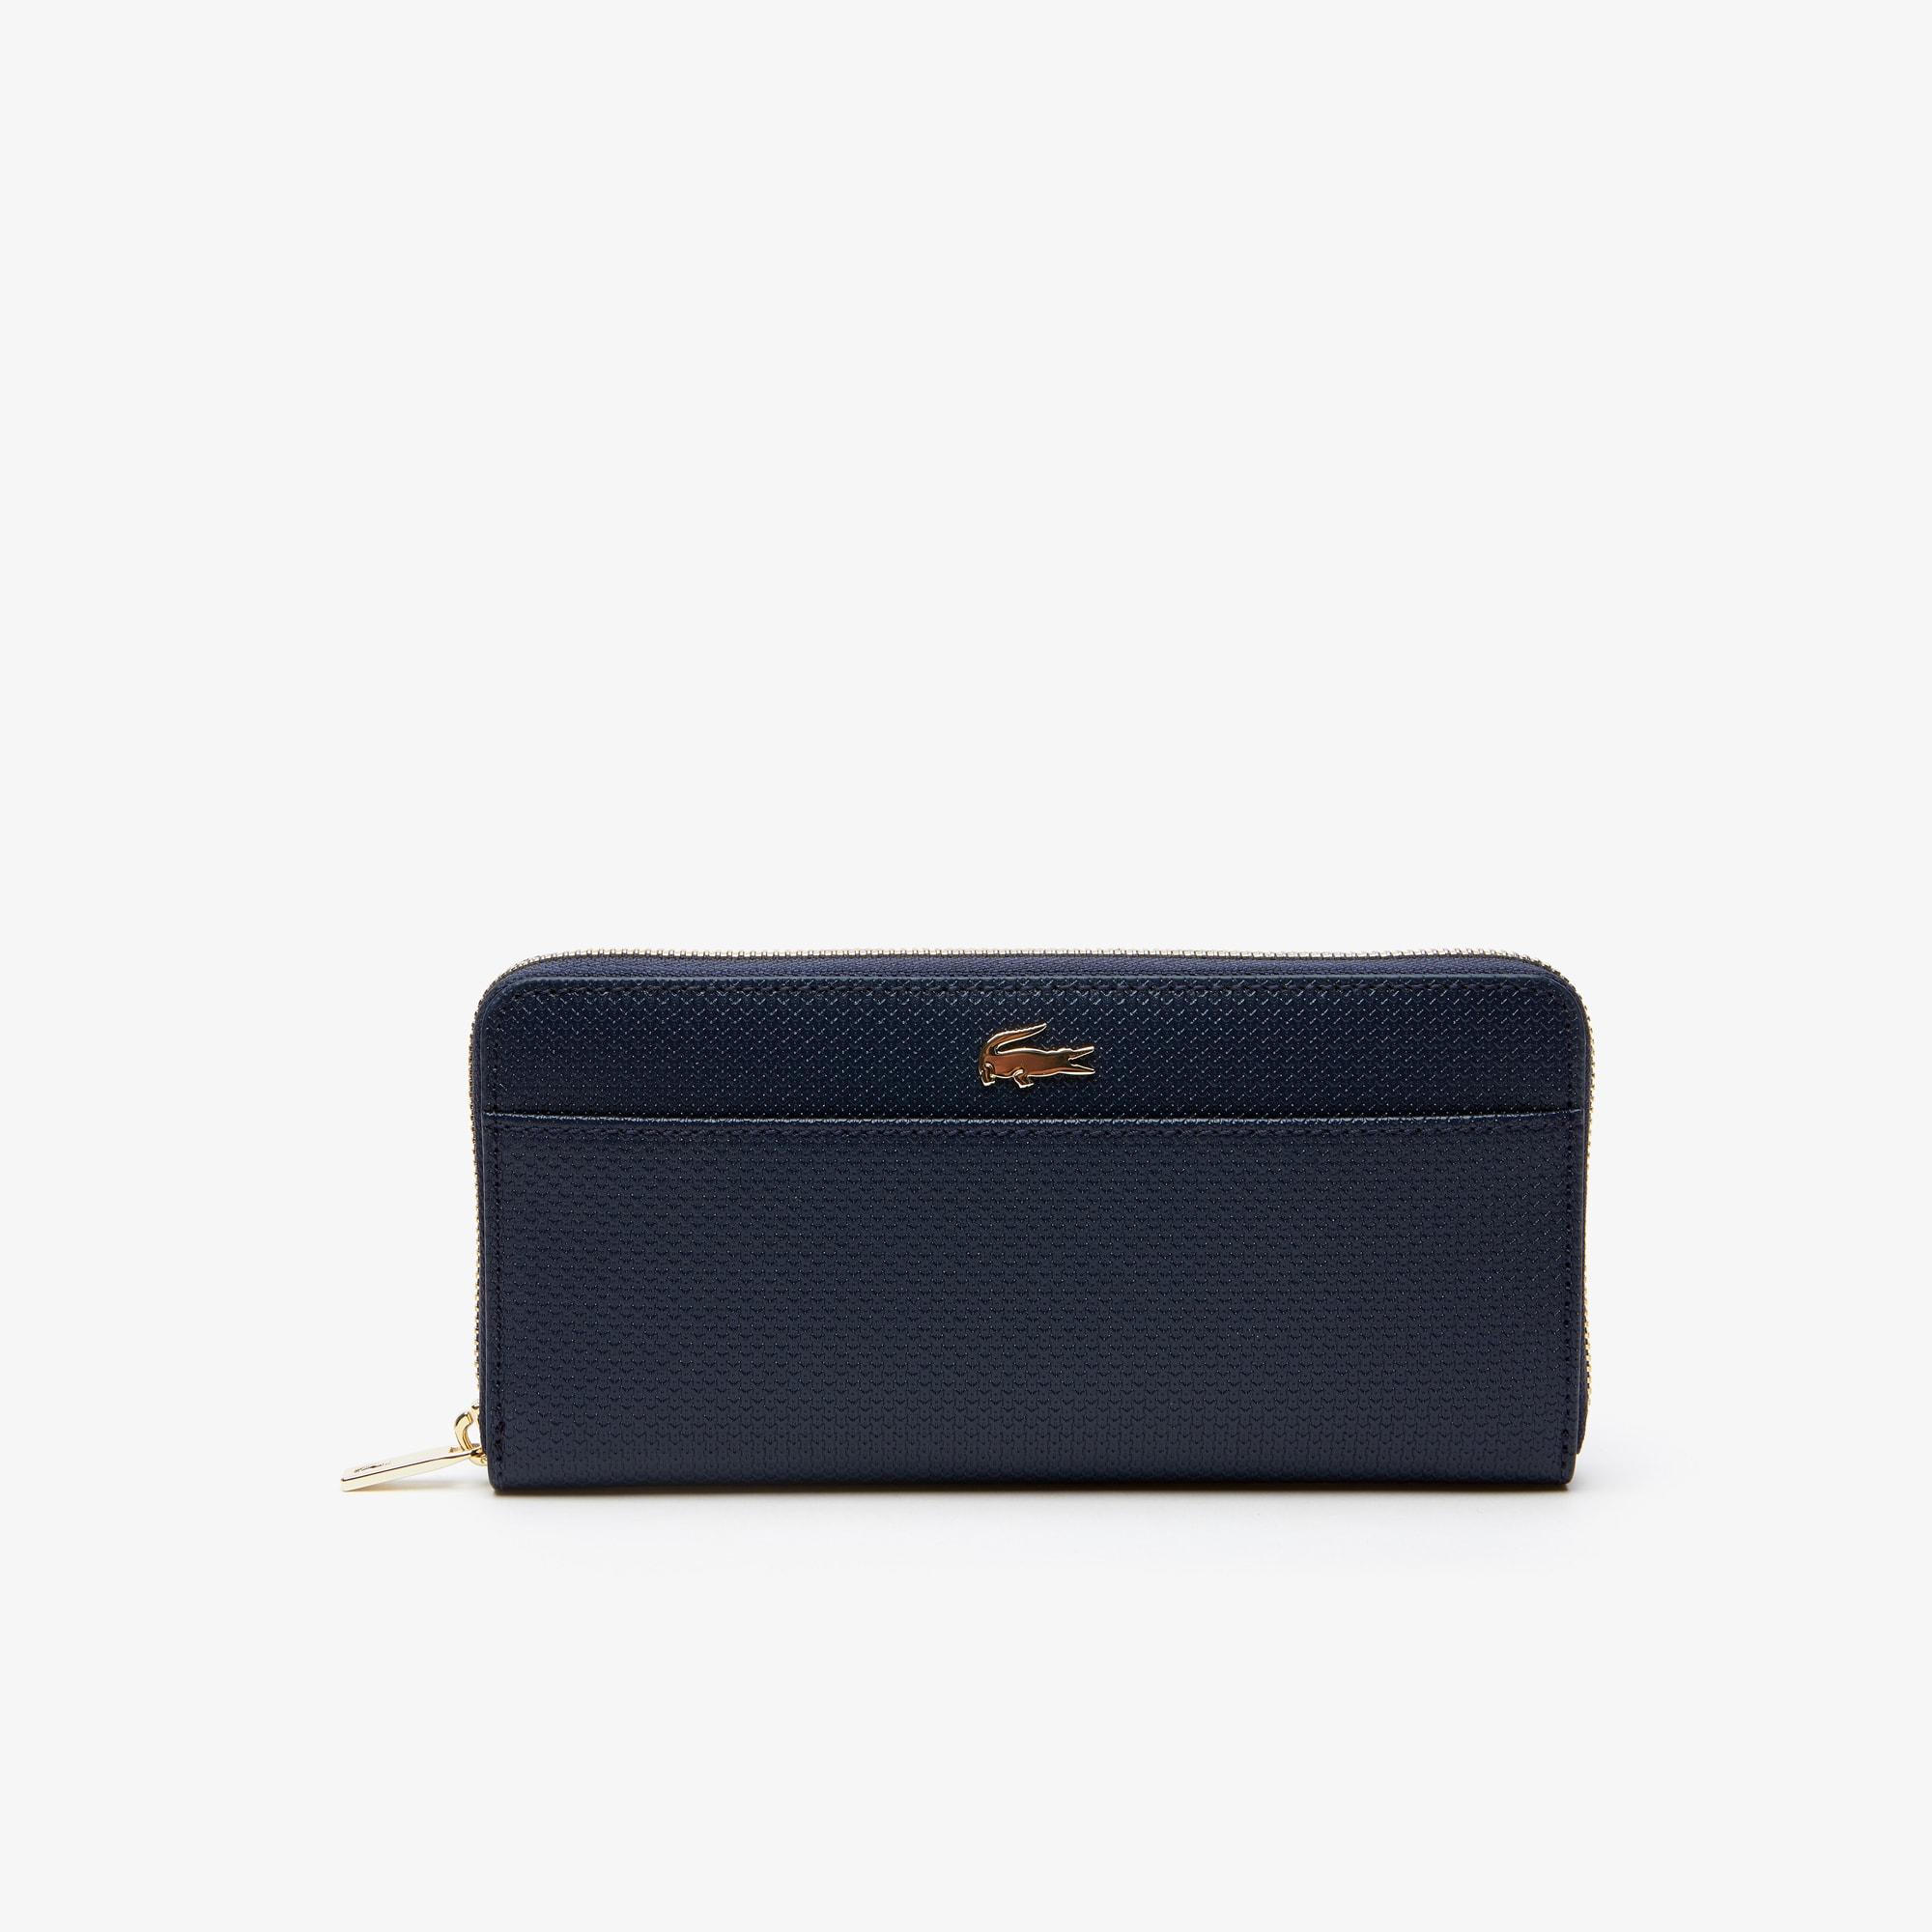 Women's Chantaco Bicolor Piqué Leather 12 Card Zip Wallet